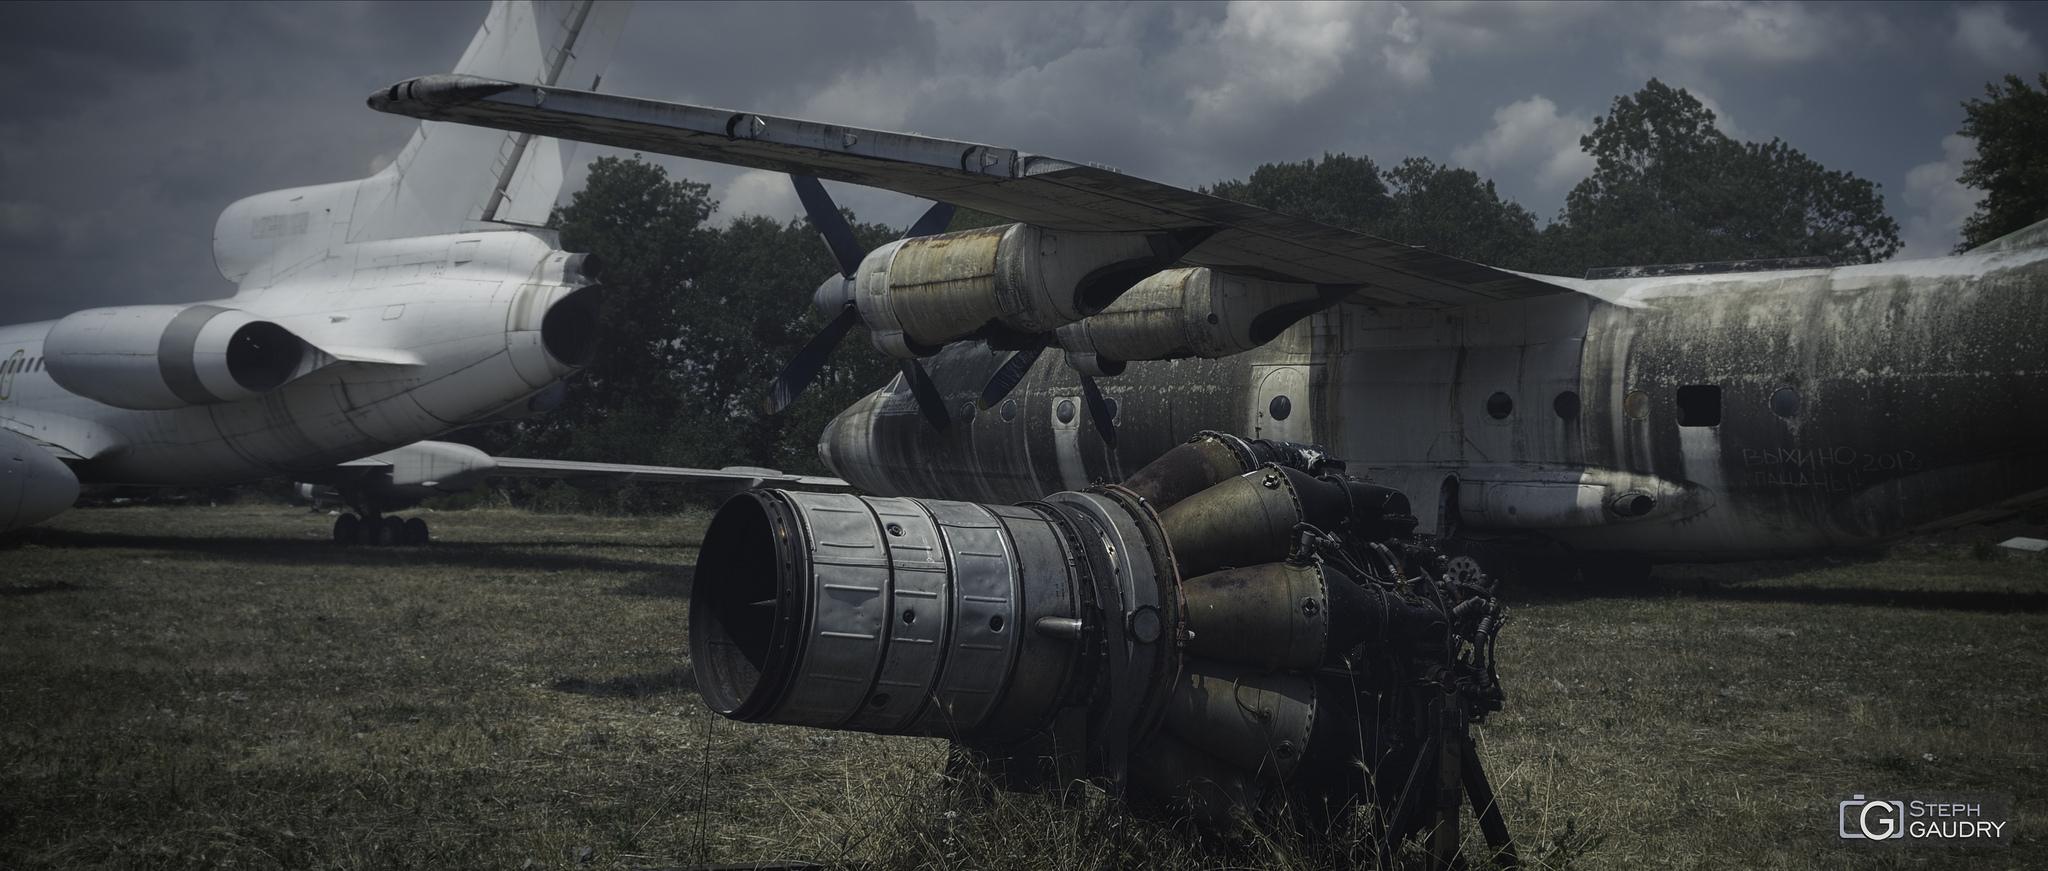 турбовинтовыми двигателями Антонова АИ-24